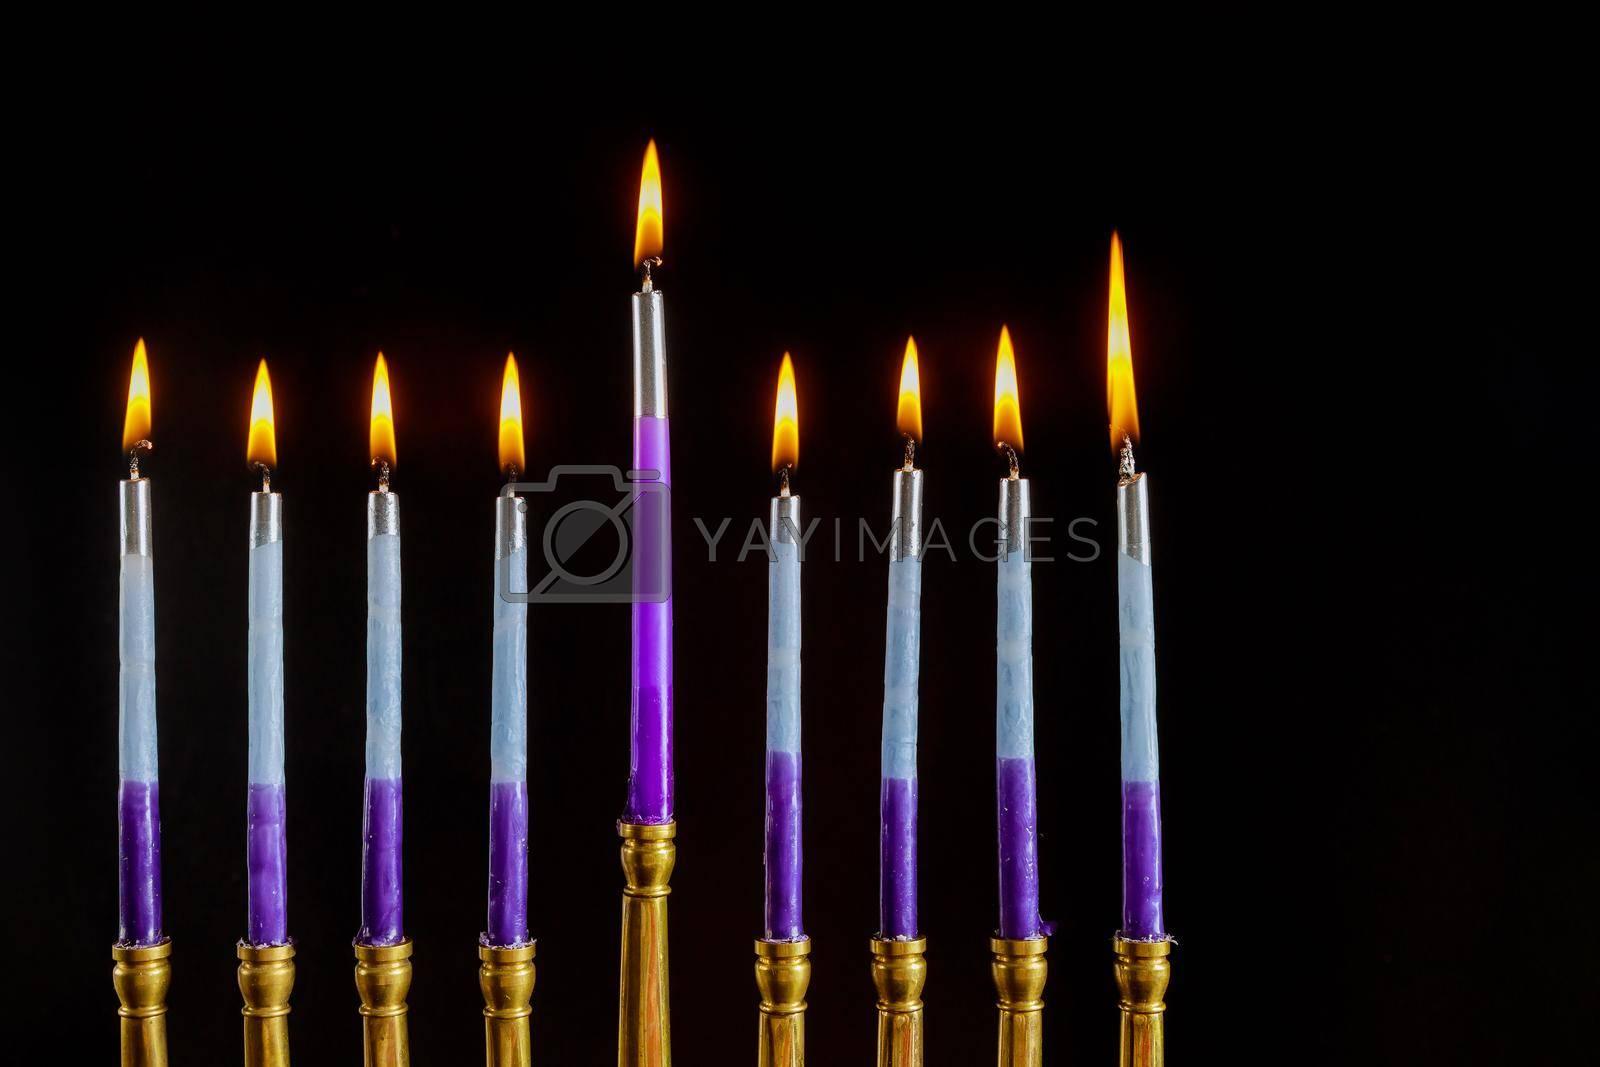 Jewish Religion holiday symbol in hanukkiah Menorah with burned out candles for Hanukkah